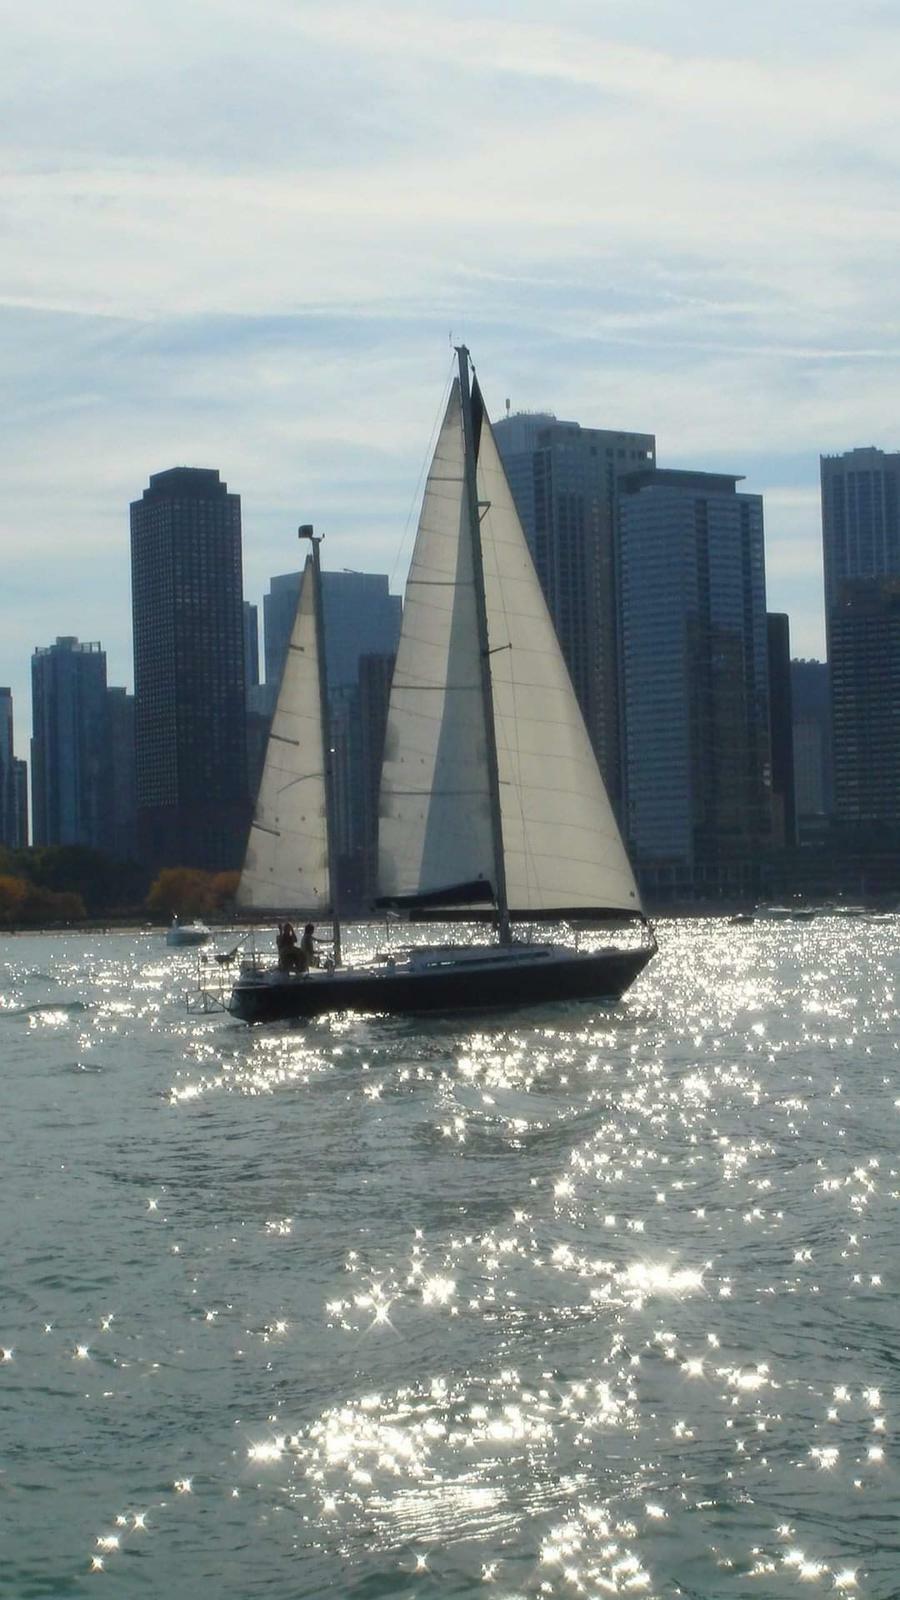 Jeanneau Gin Fizz sailing boat 37ft